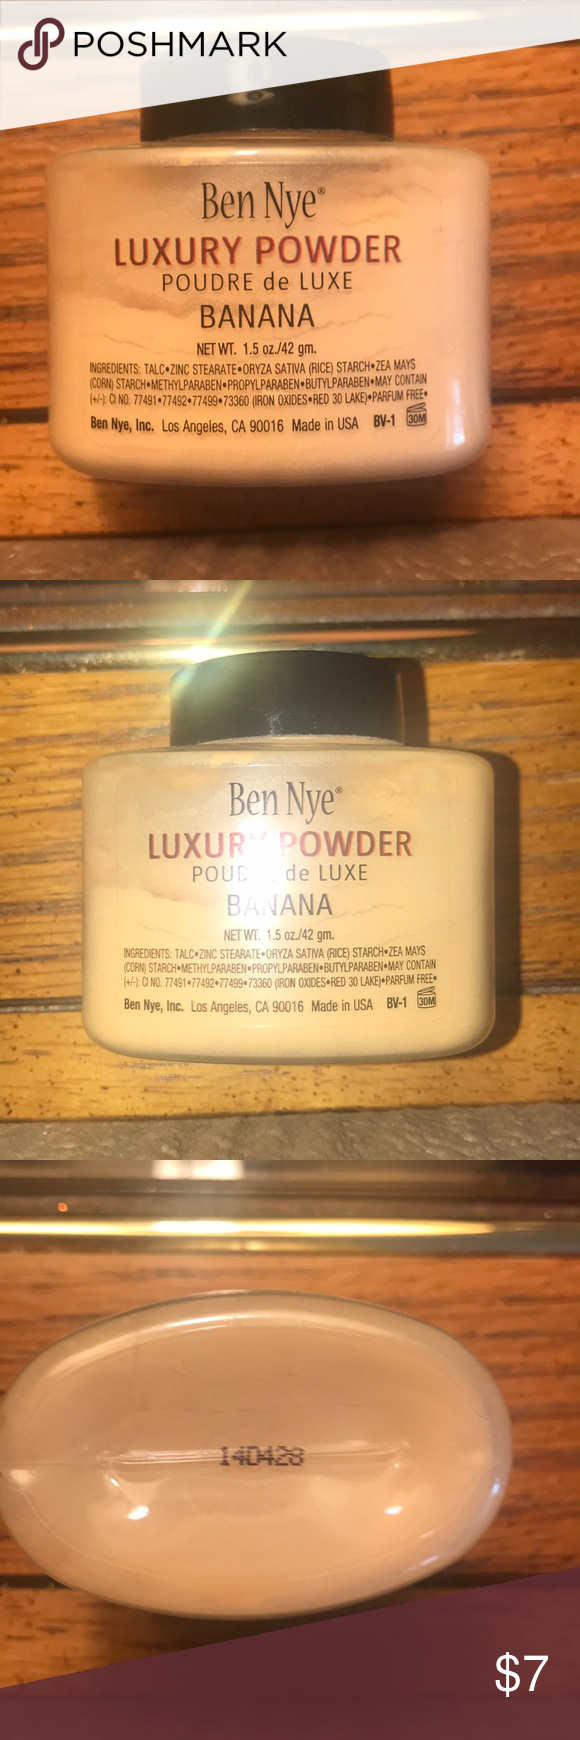 Ben Nye Banana Powder 1.5 oz Ben Nye Banana Powder 1.5 oz